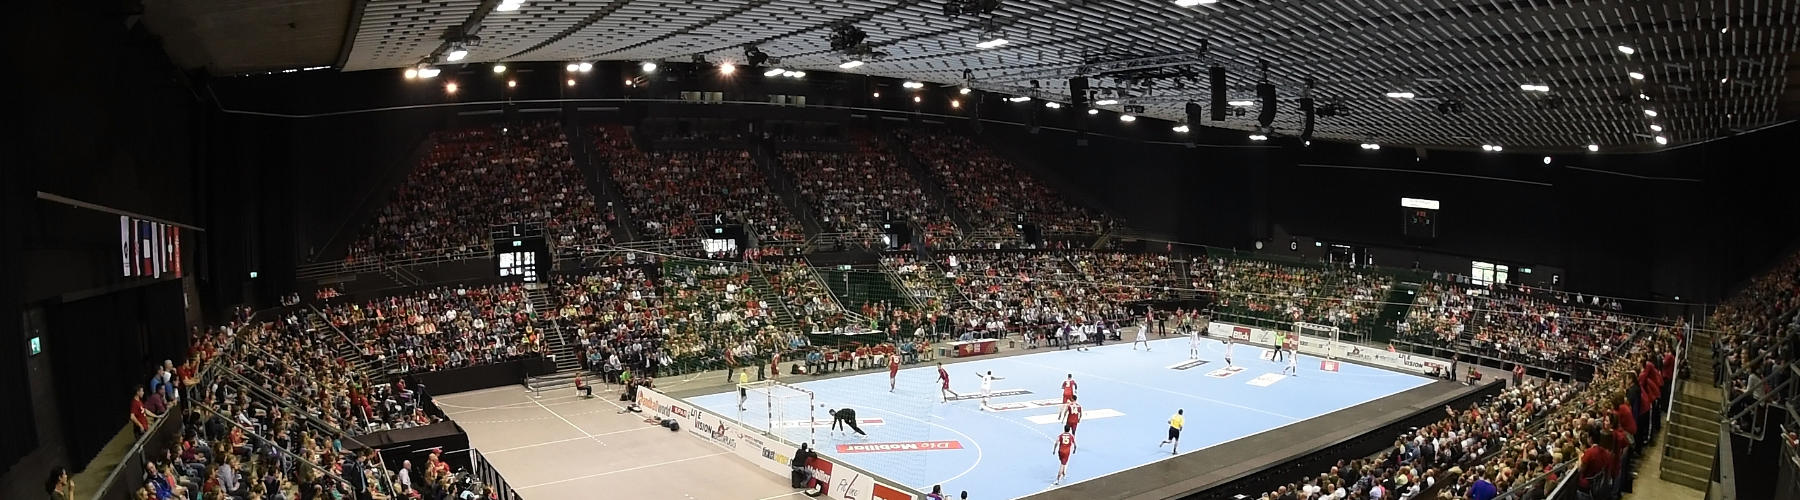 Handball Schweiz cover image